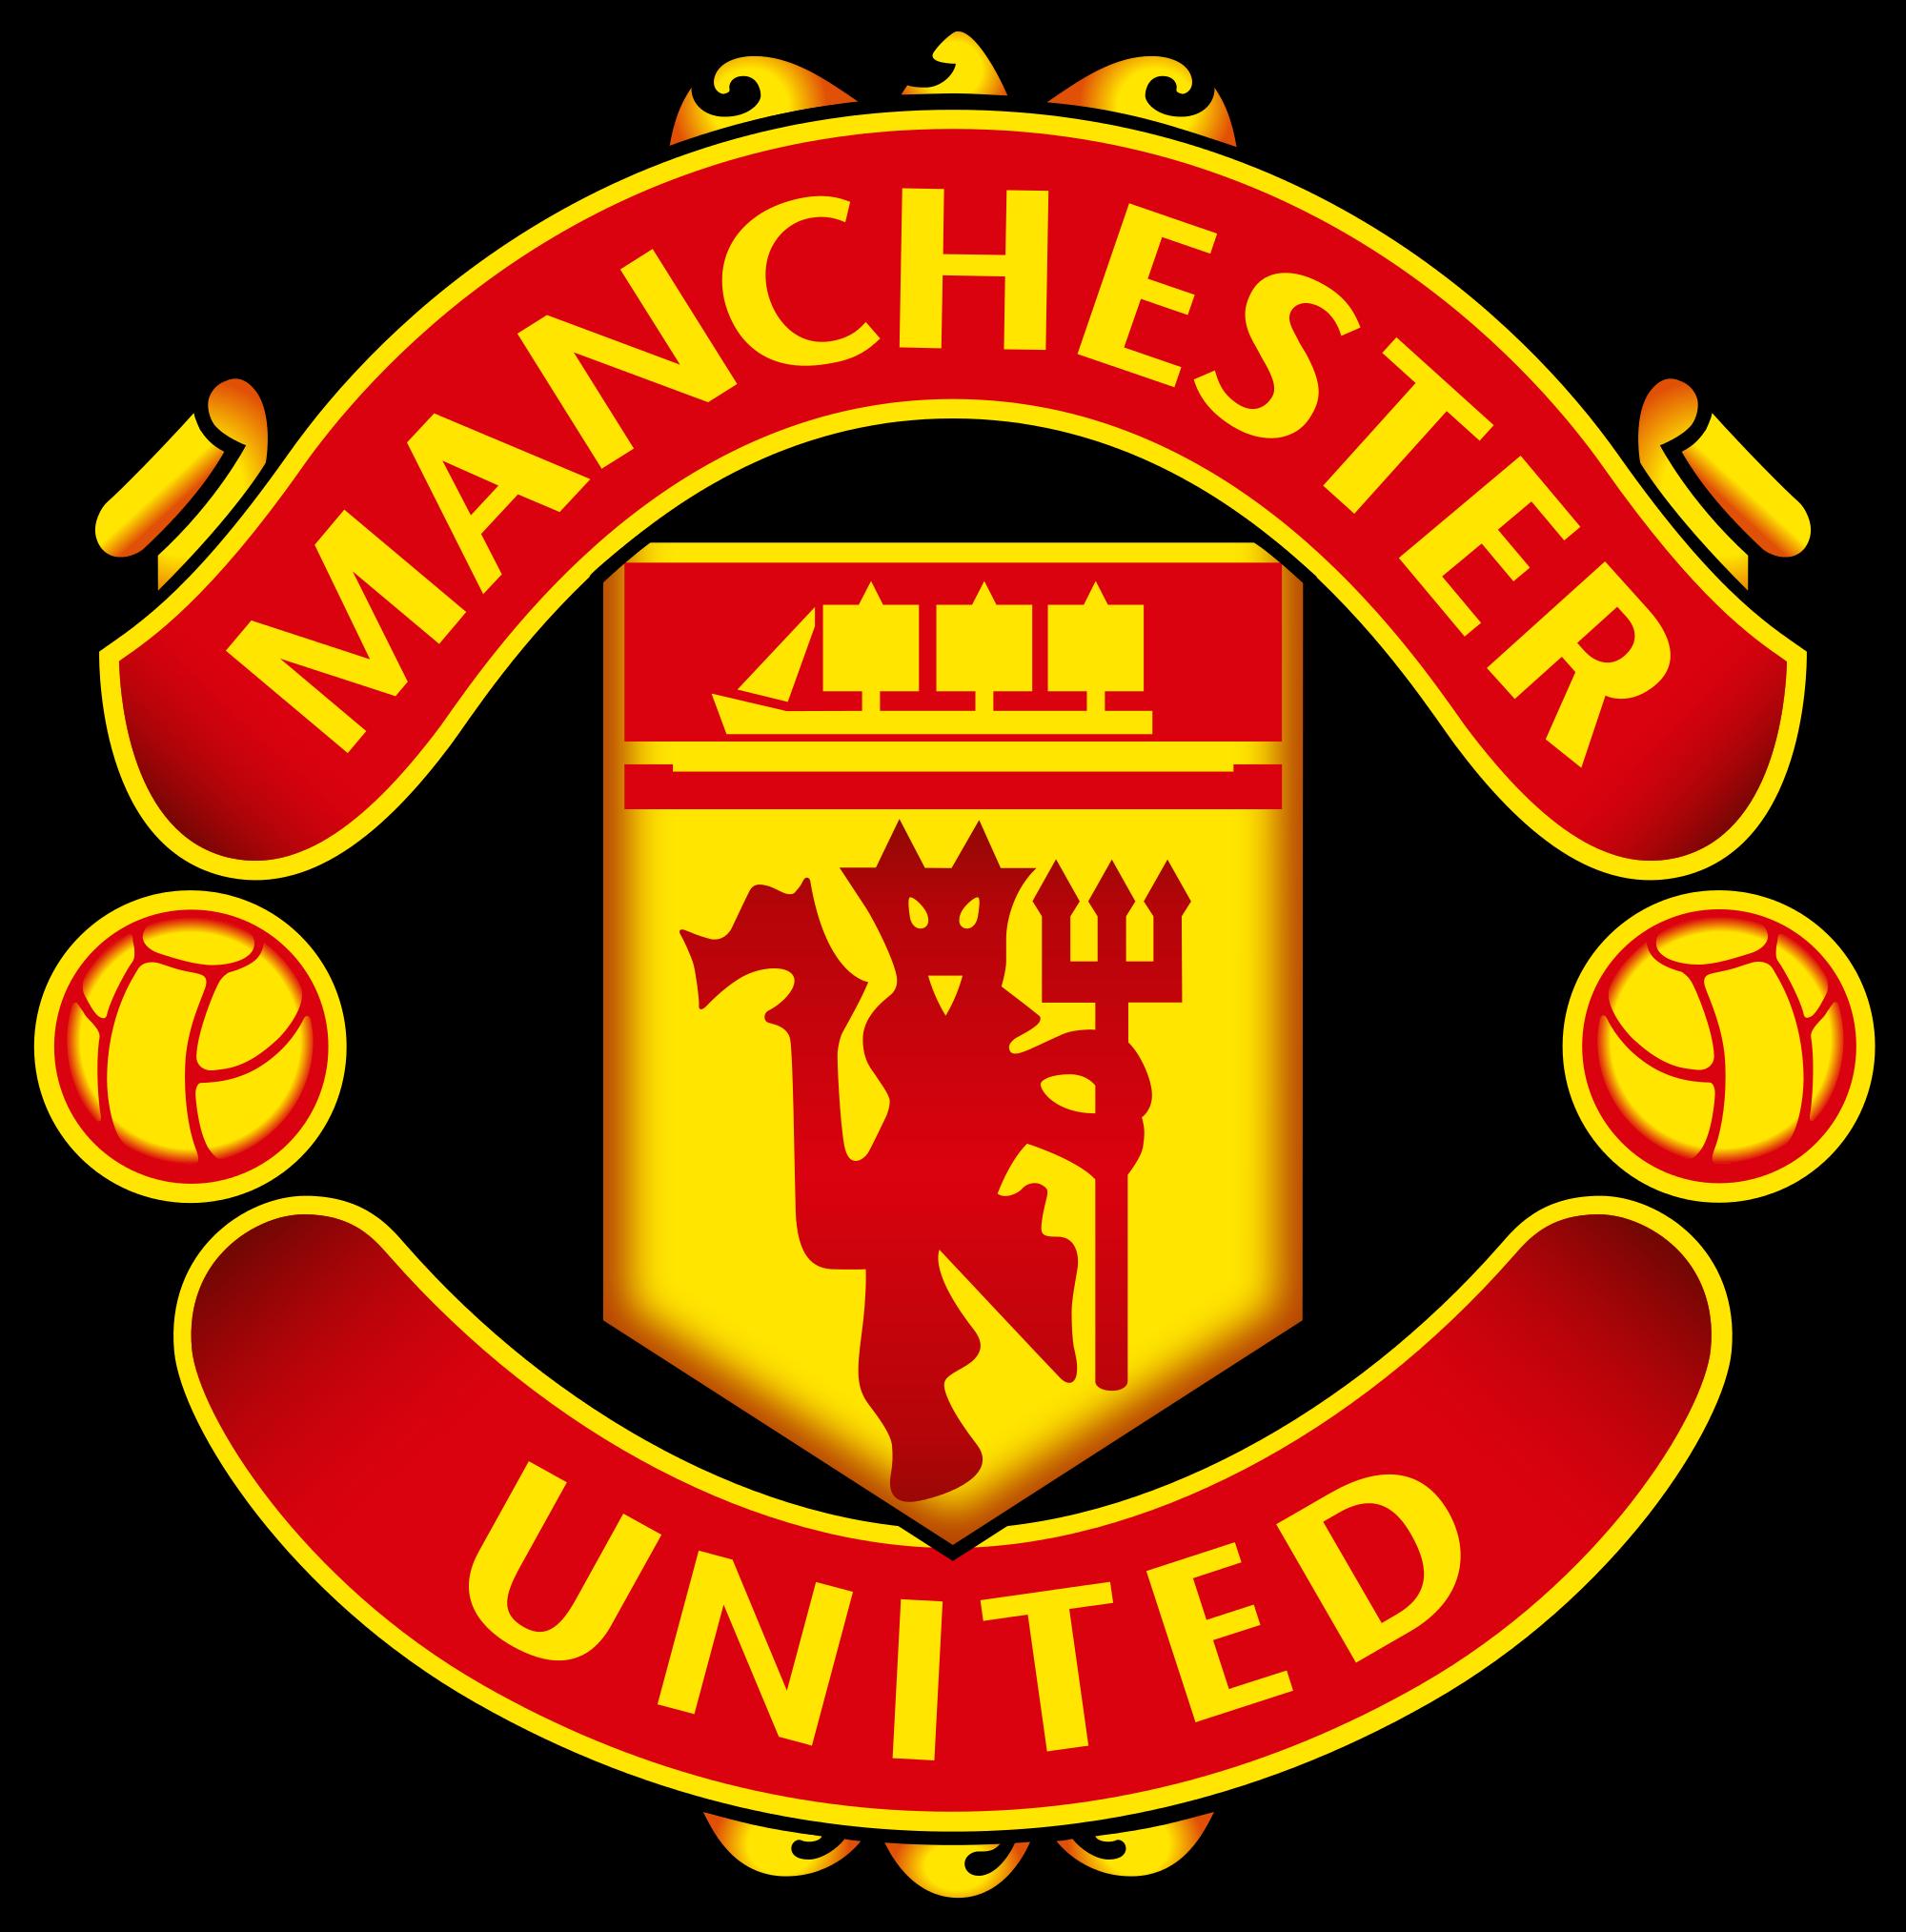 Premier Liague By Soccer Land Manchester United Logo Manchester United Badge Manchester United